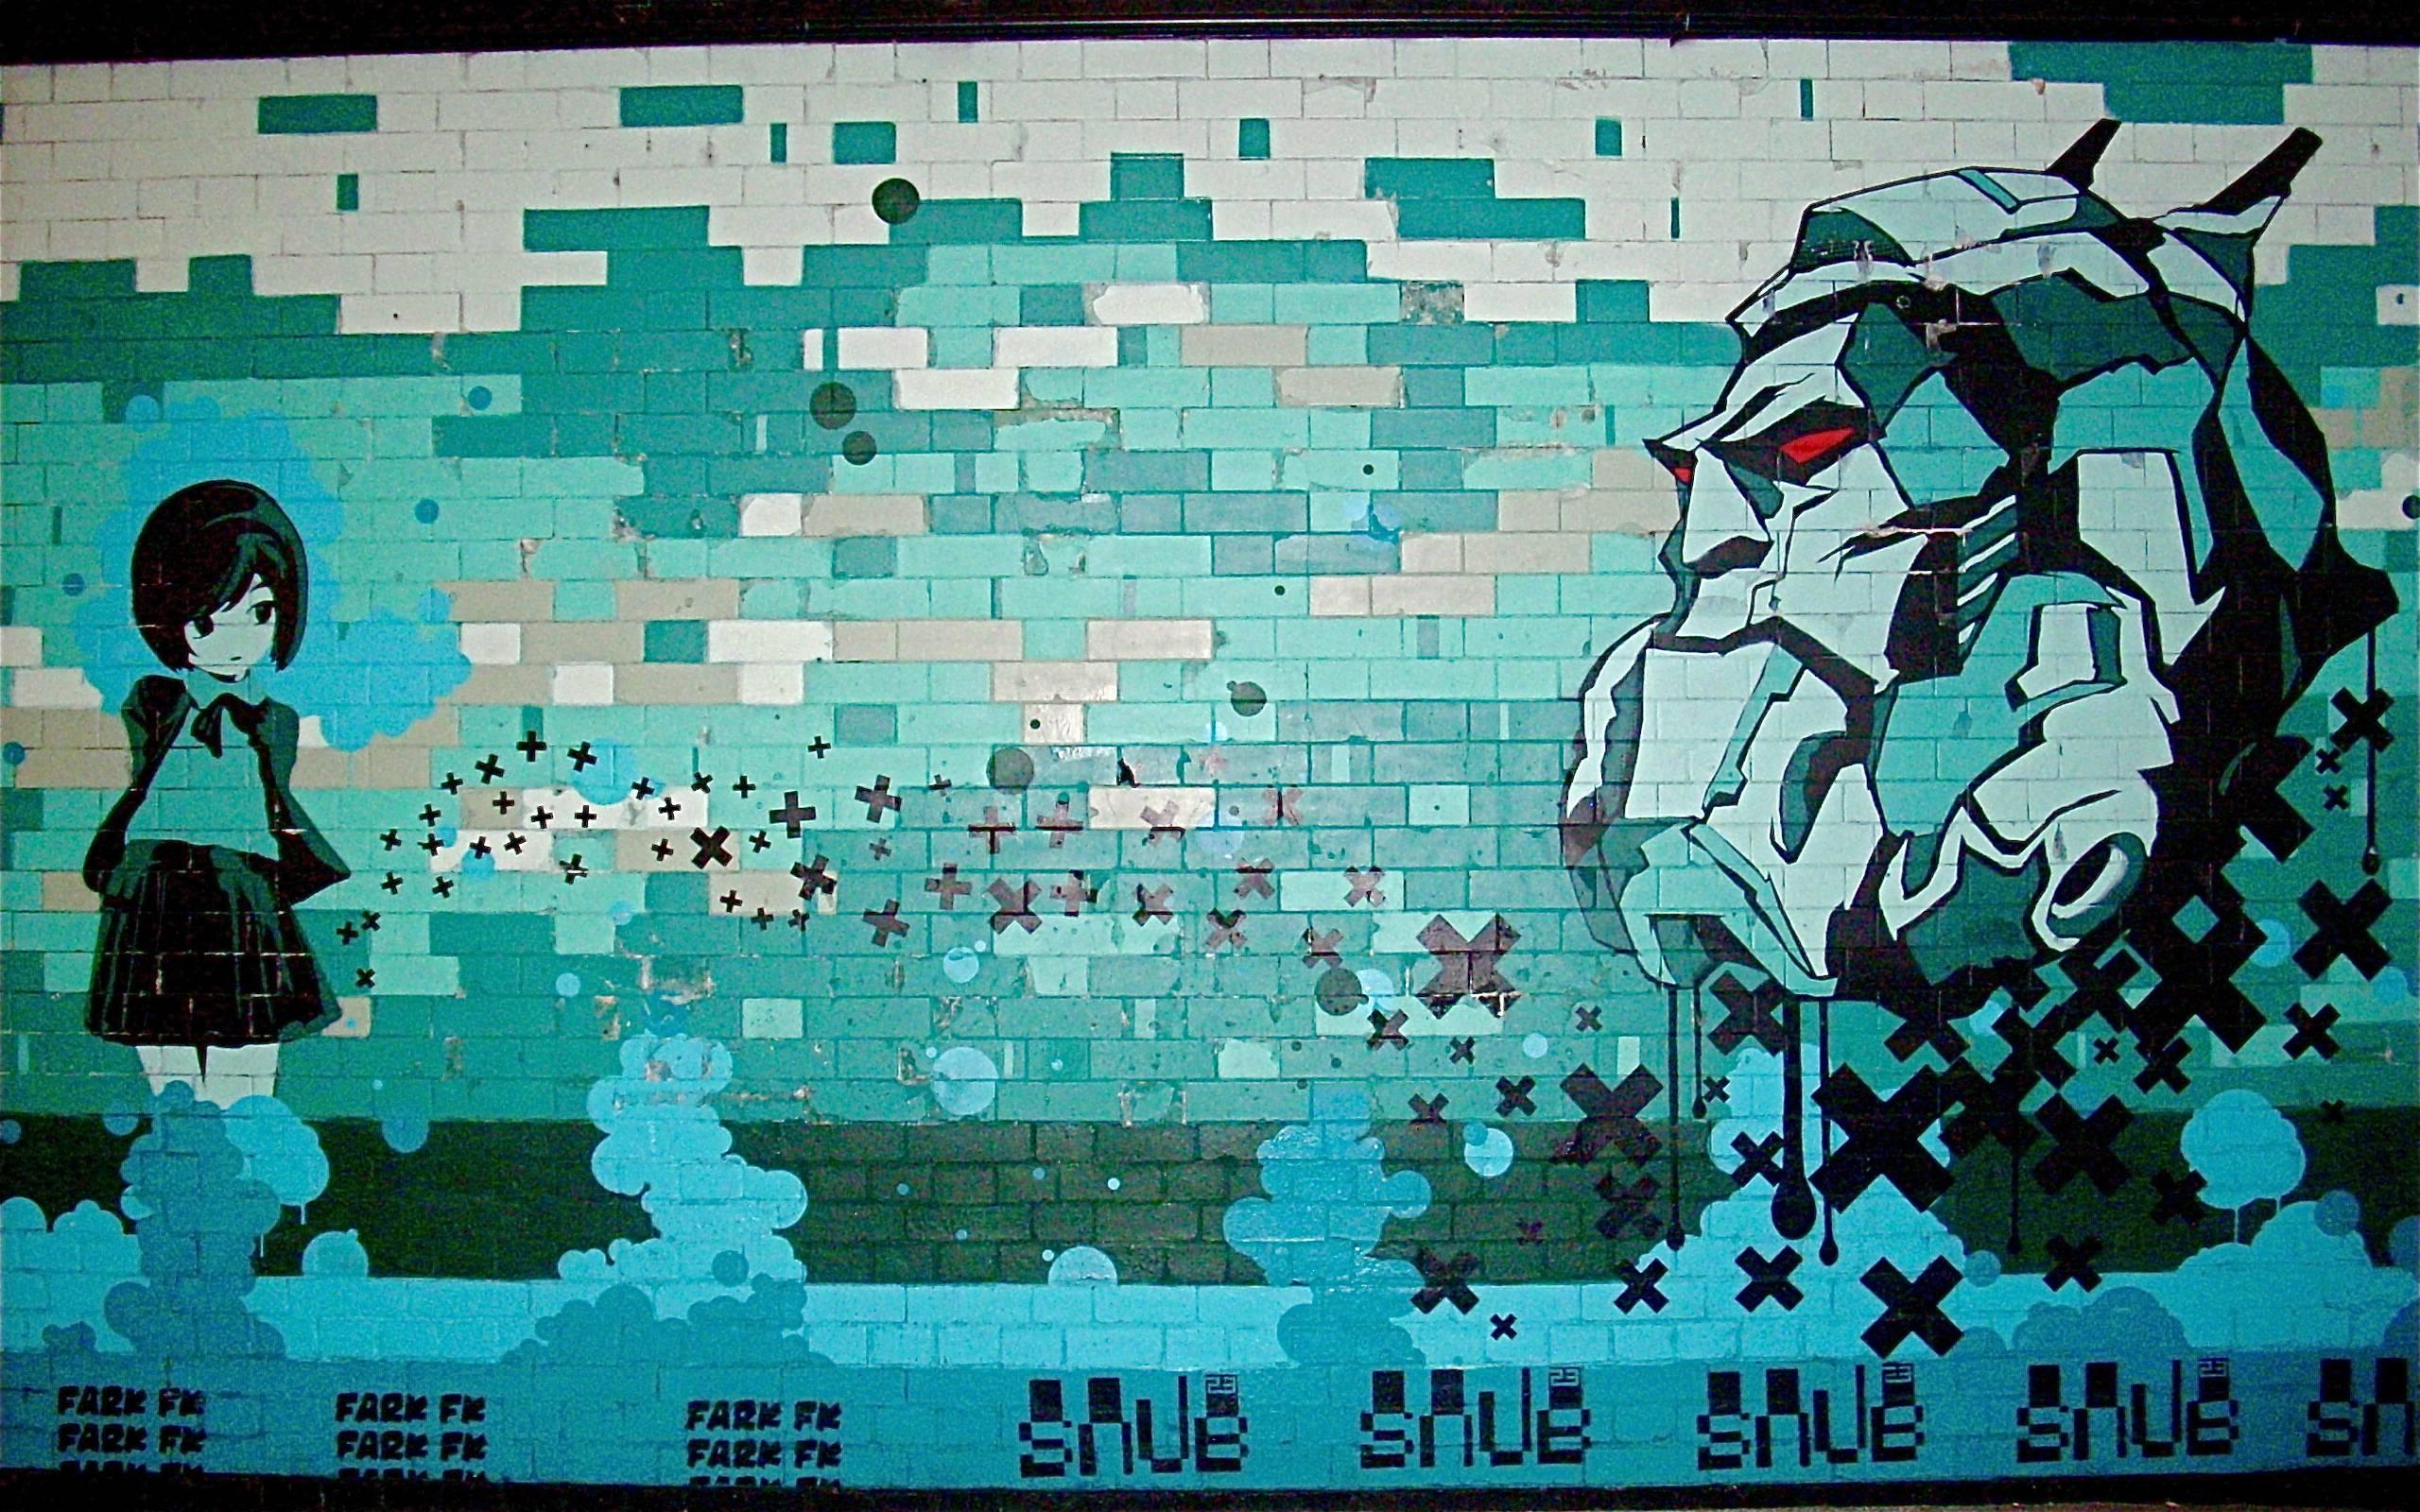 Anime Graffiti Google Skins Anime Graffiti Google Backgrounds Anime 2560x1600